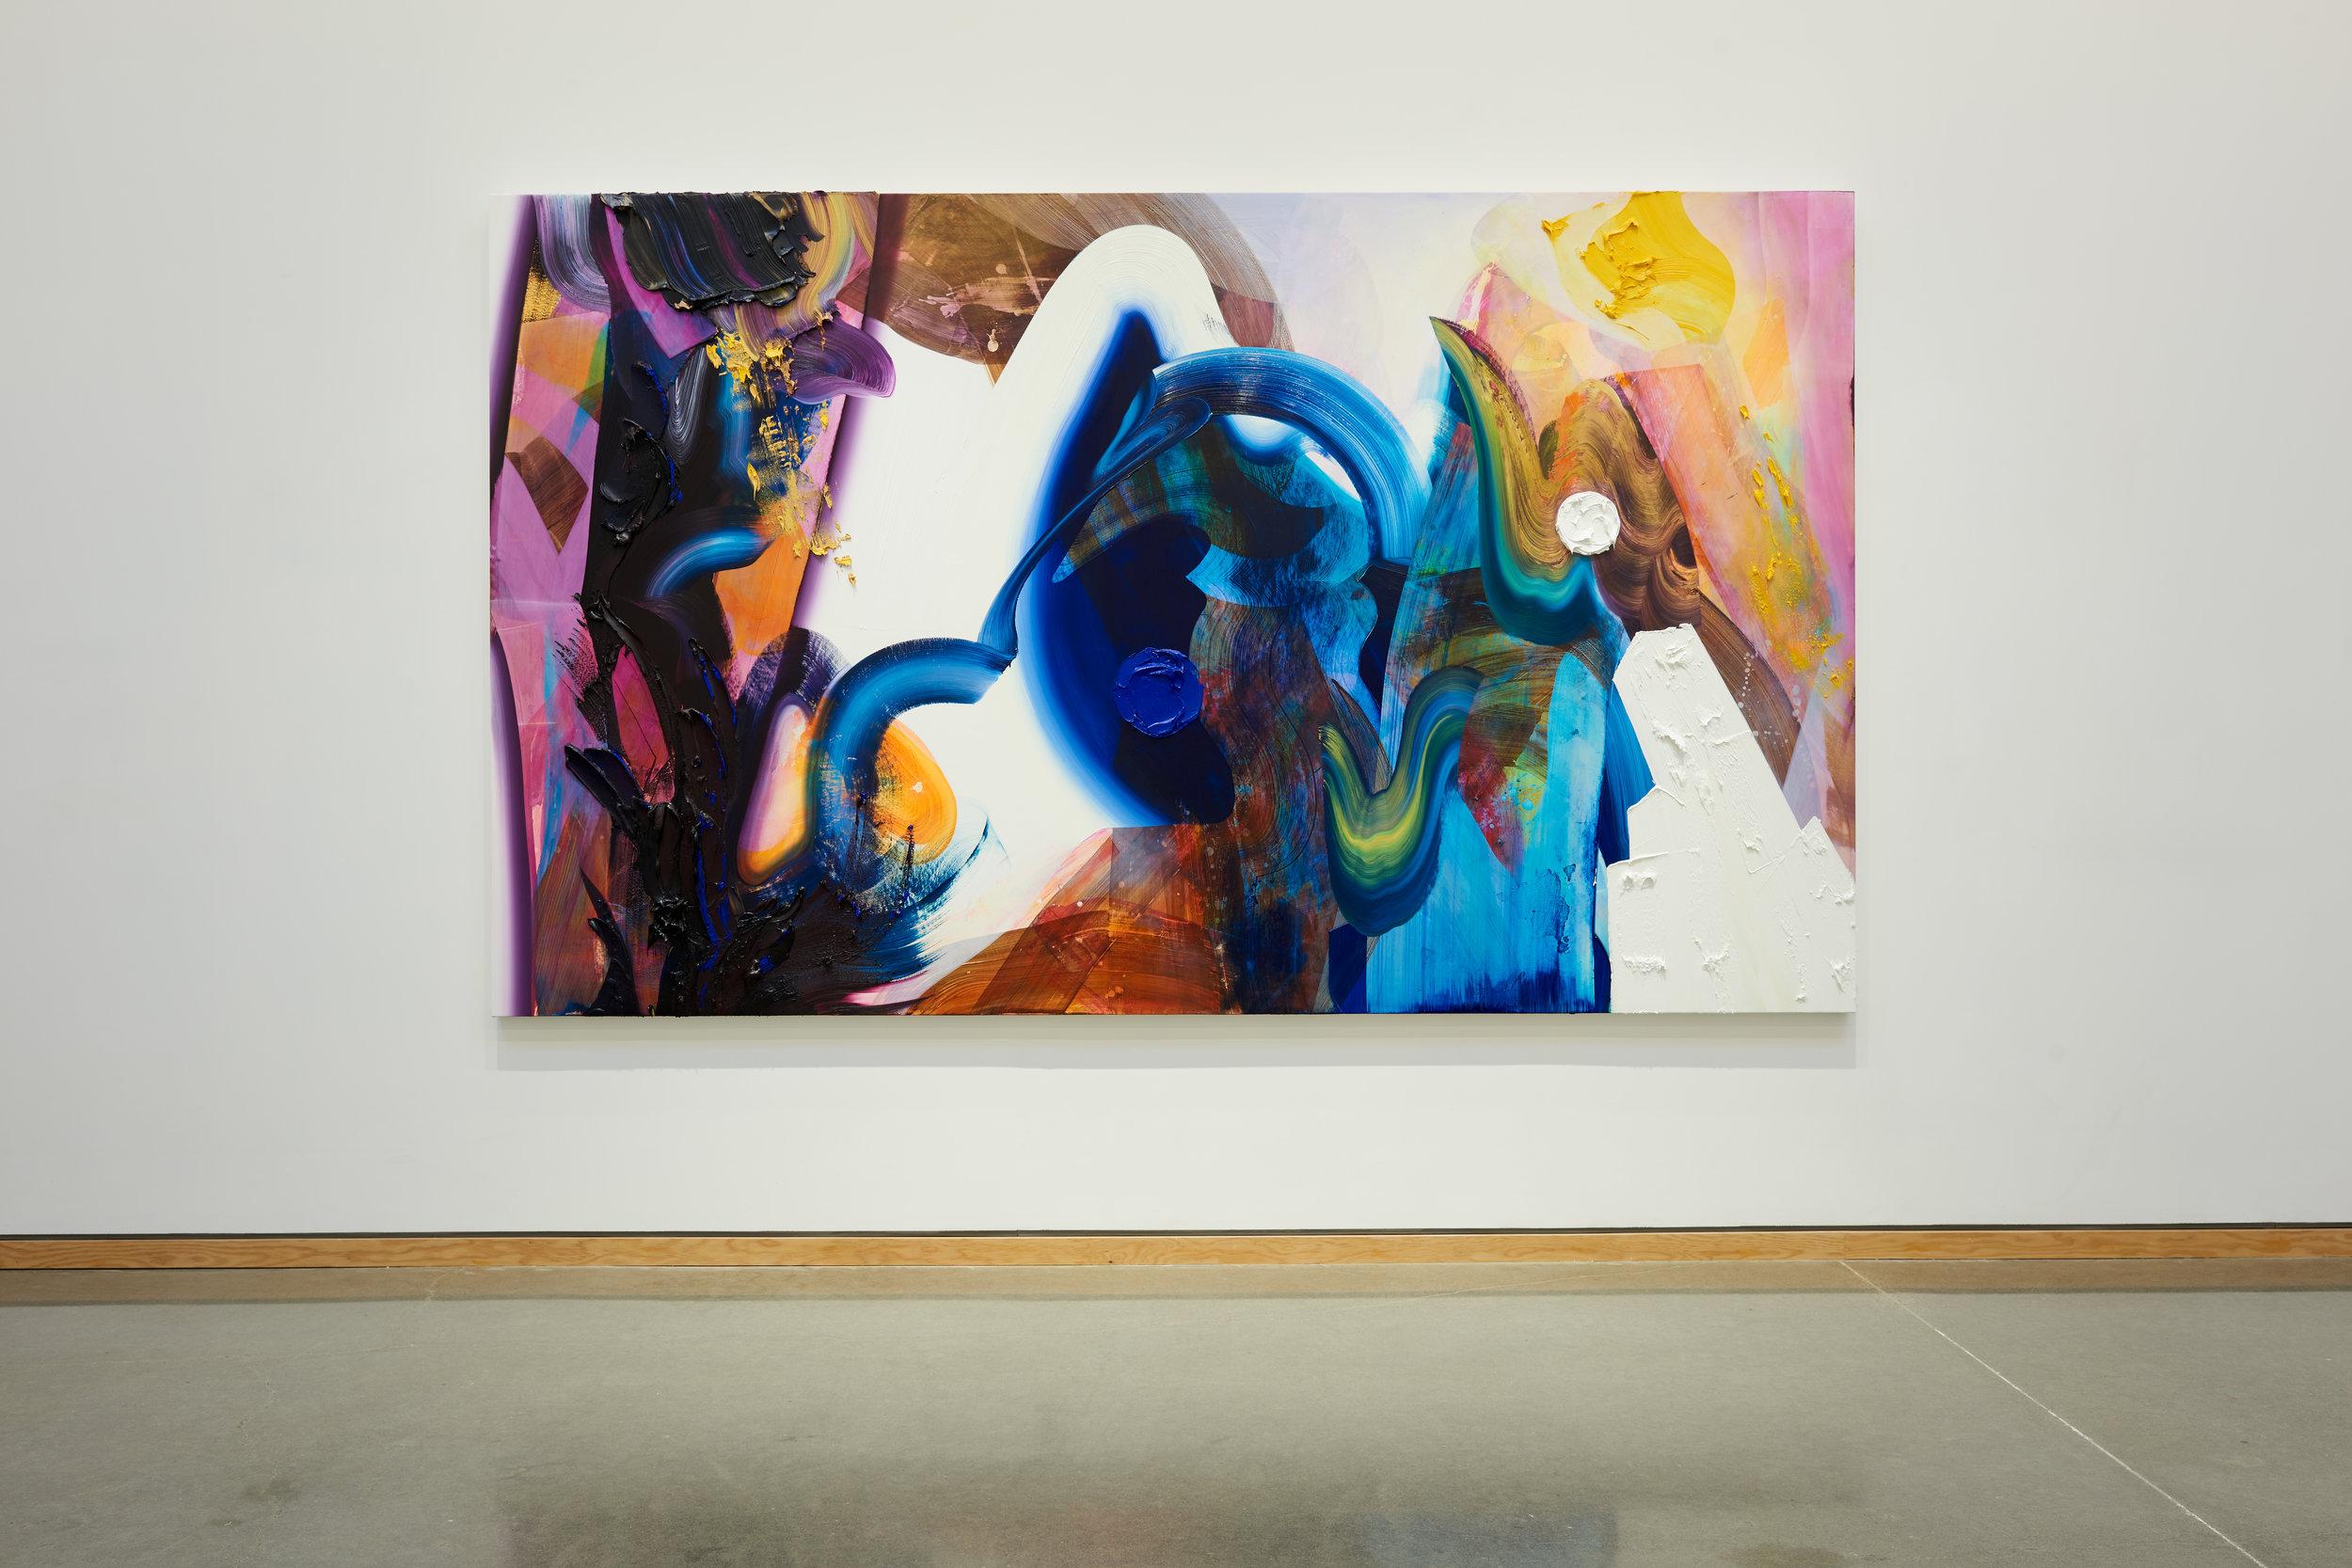 Installation view, Angell Gallery, Toronto